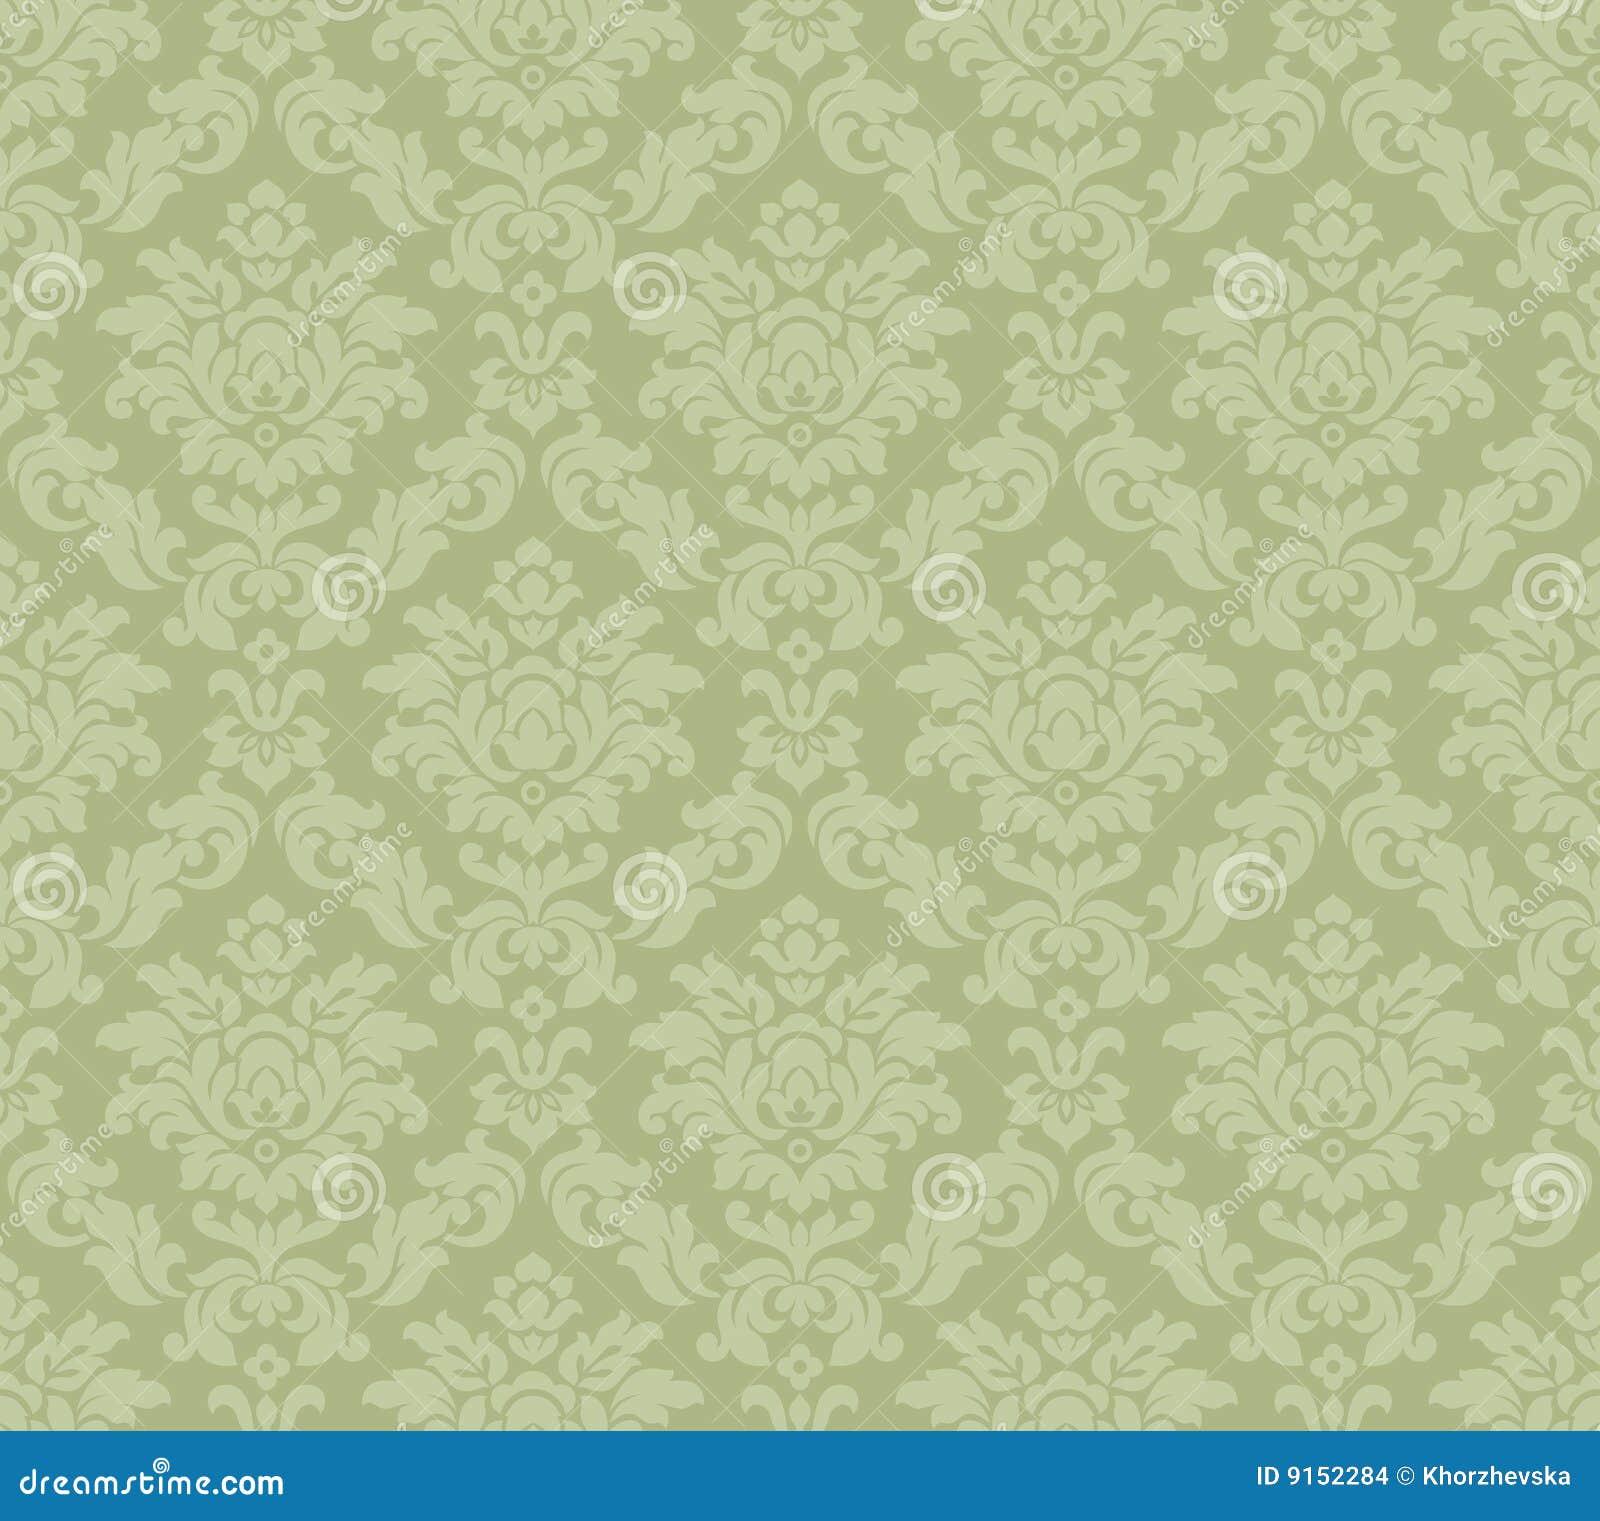 baroque venetian wallpaper stock vector illustration of. Black Bedroom Furniture Sets. Home Design Ideas